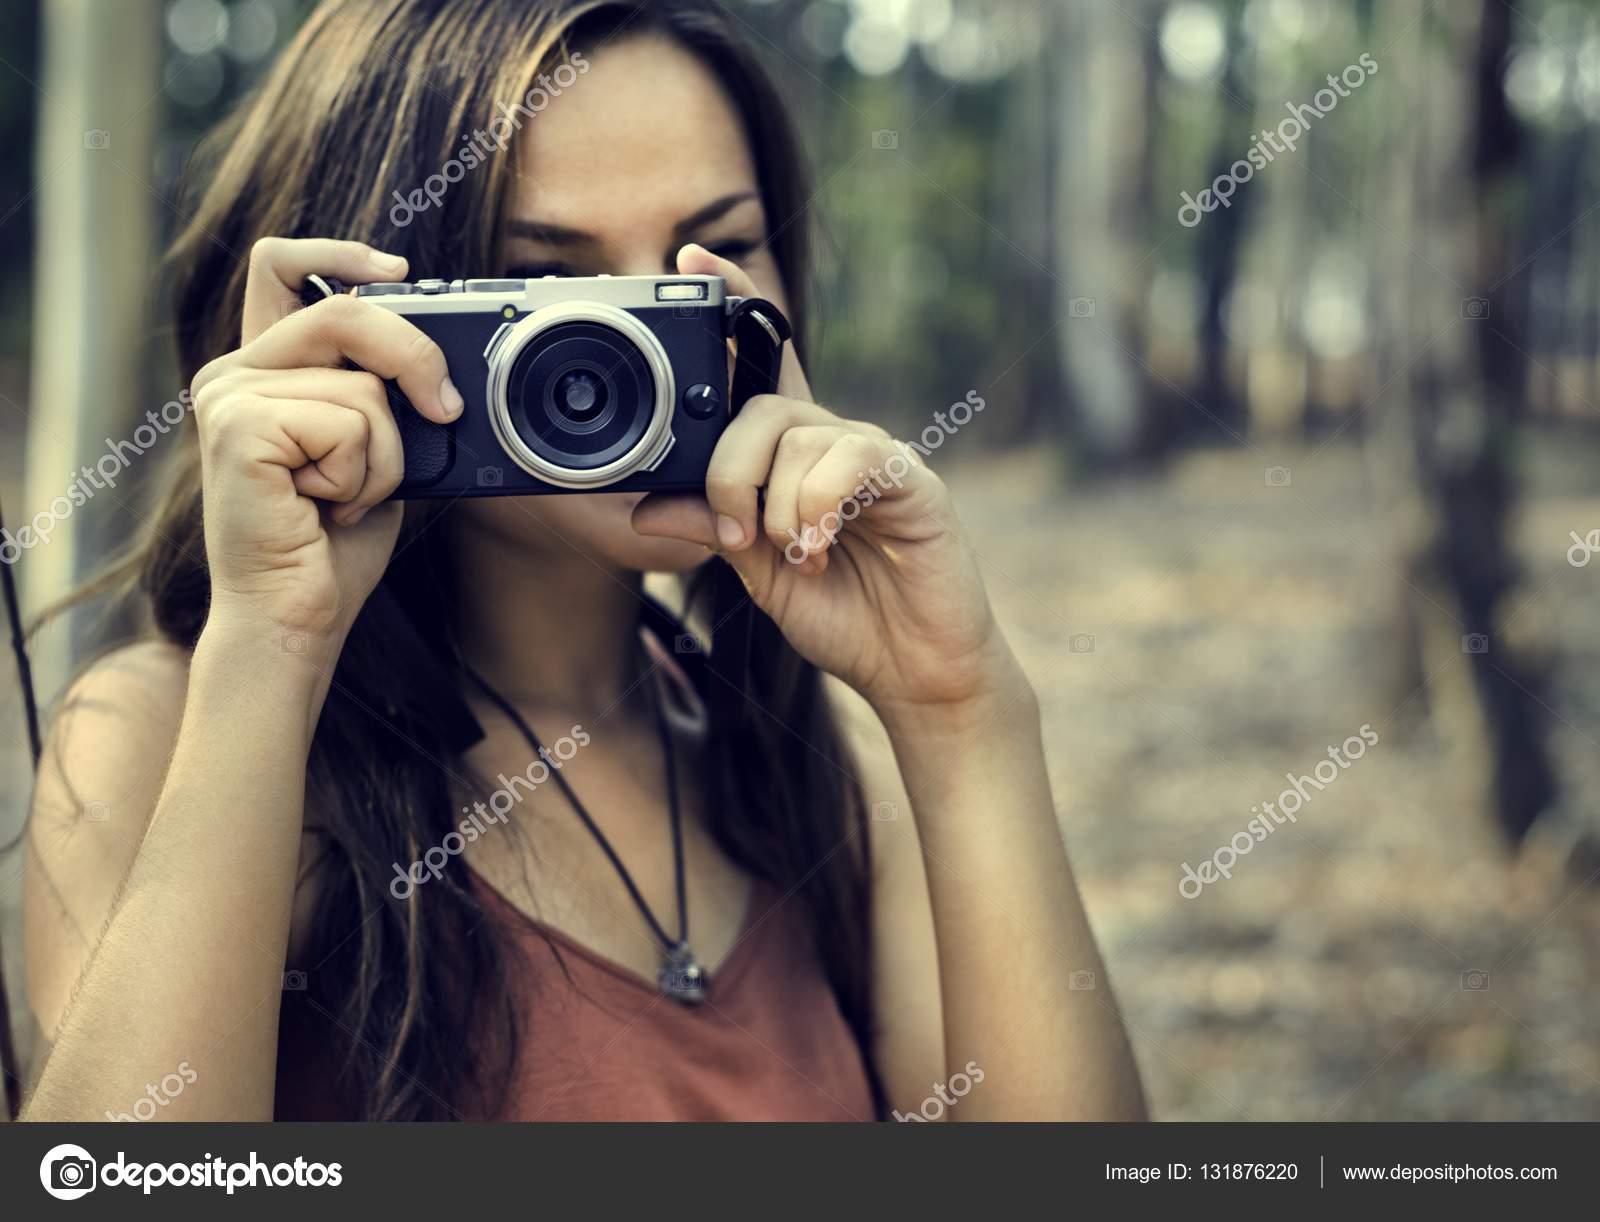 Frau Fotograf Holding Kamera — Stockfoto © Rawpixel #131876220